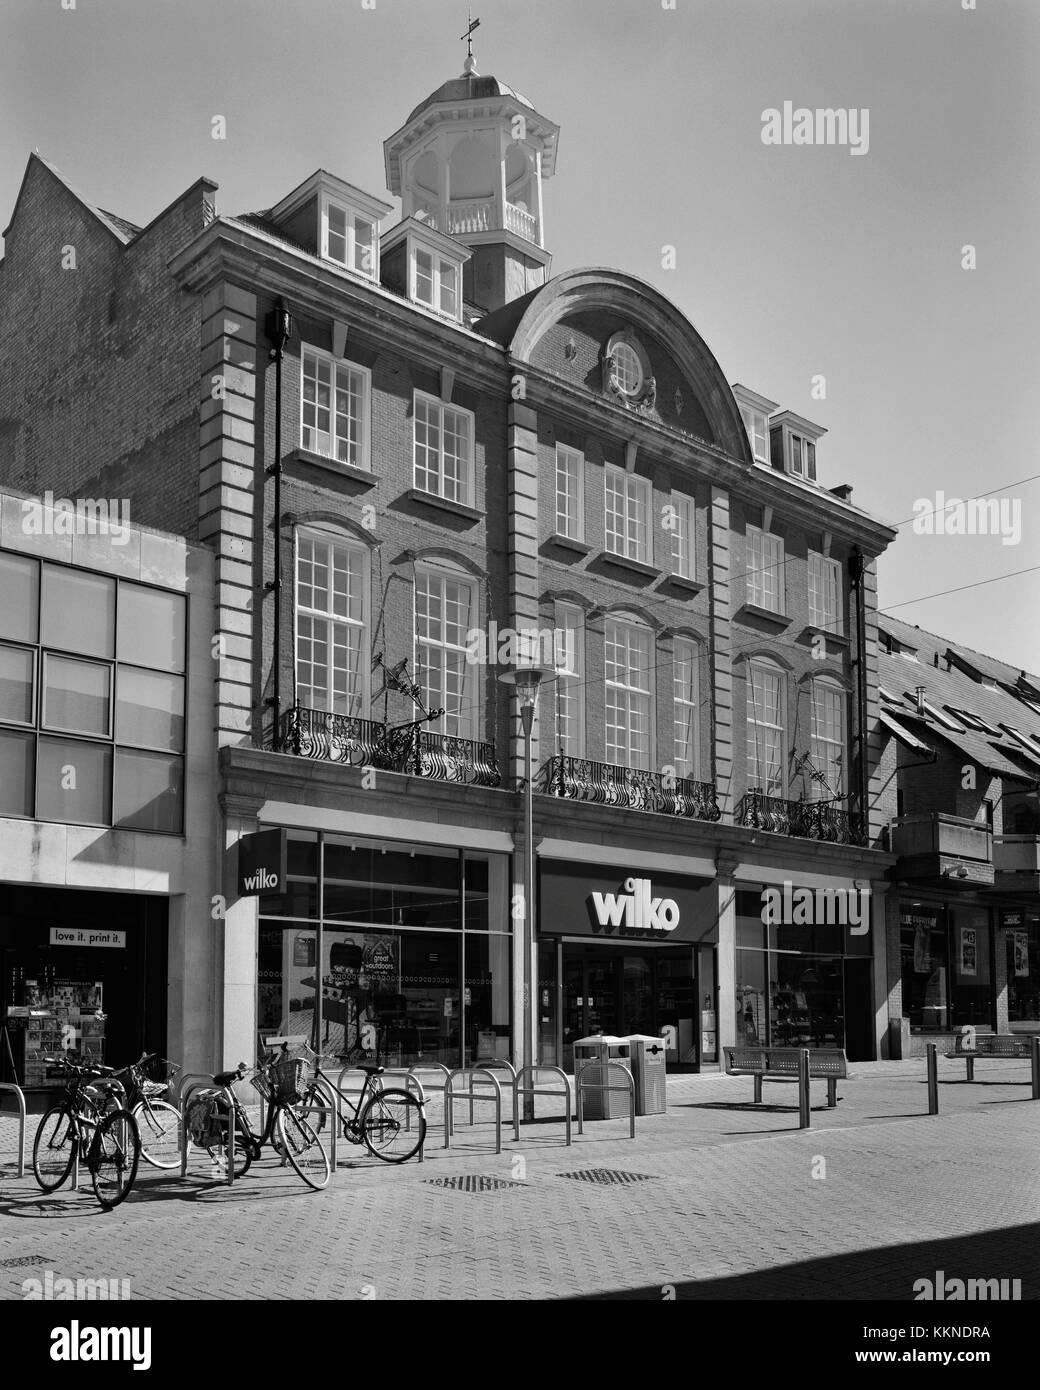 Wilko store at 17 Fitzroy Street Cambridge - Stock Image